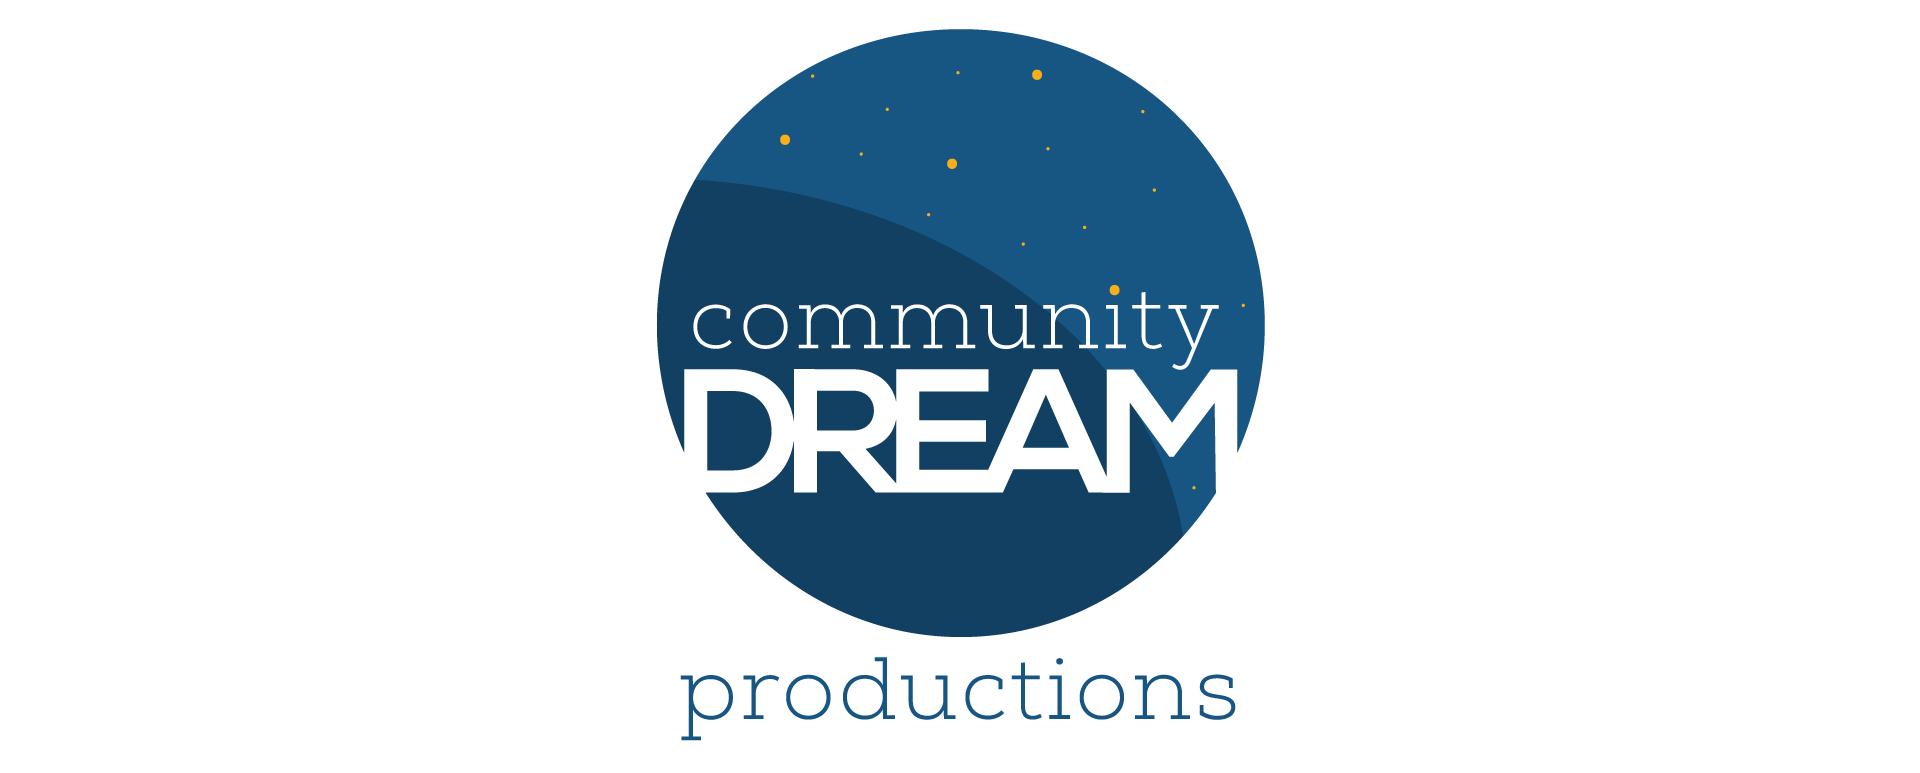 Community-Dream-Productions_web-logo.png